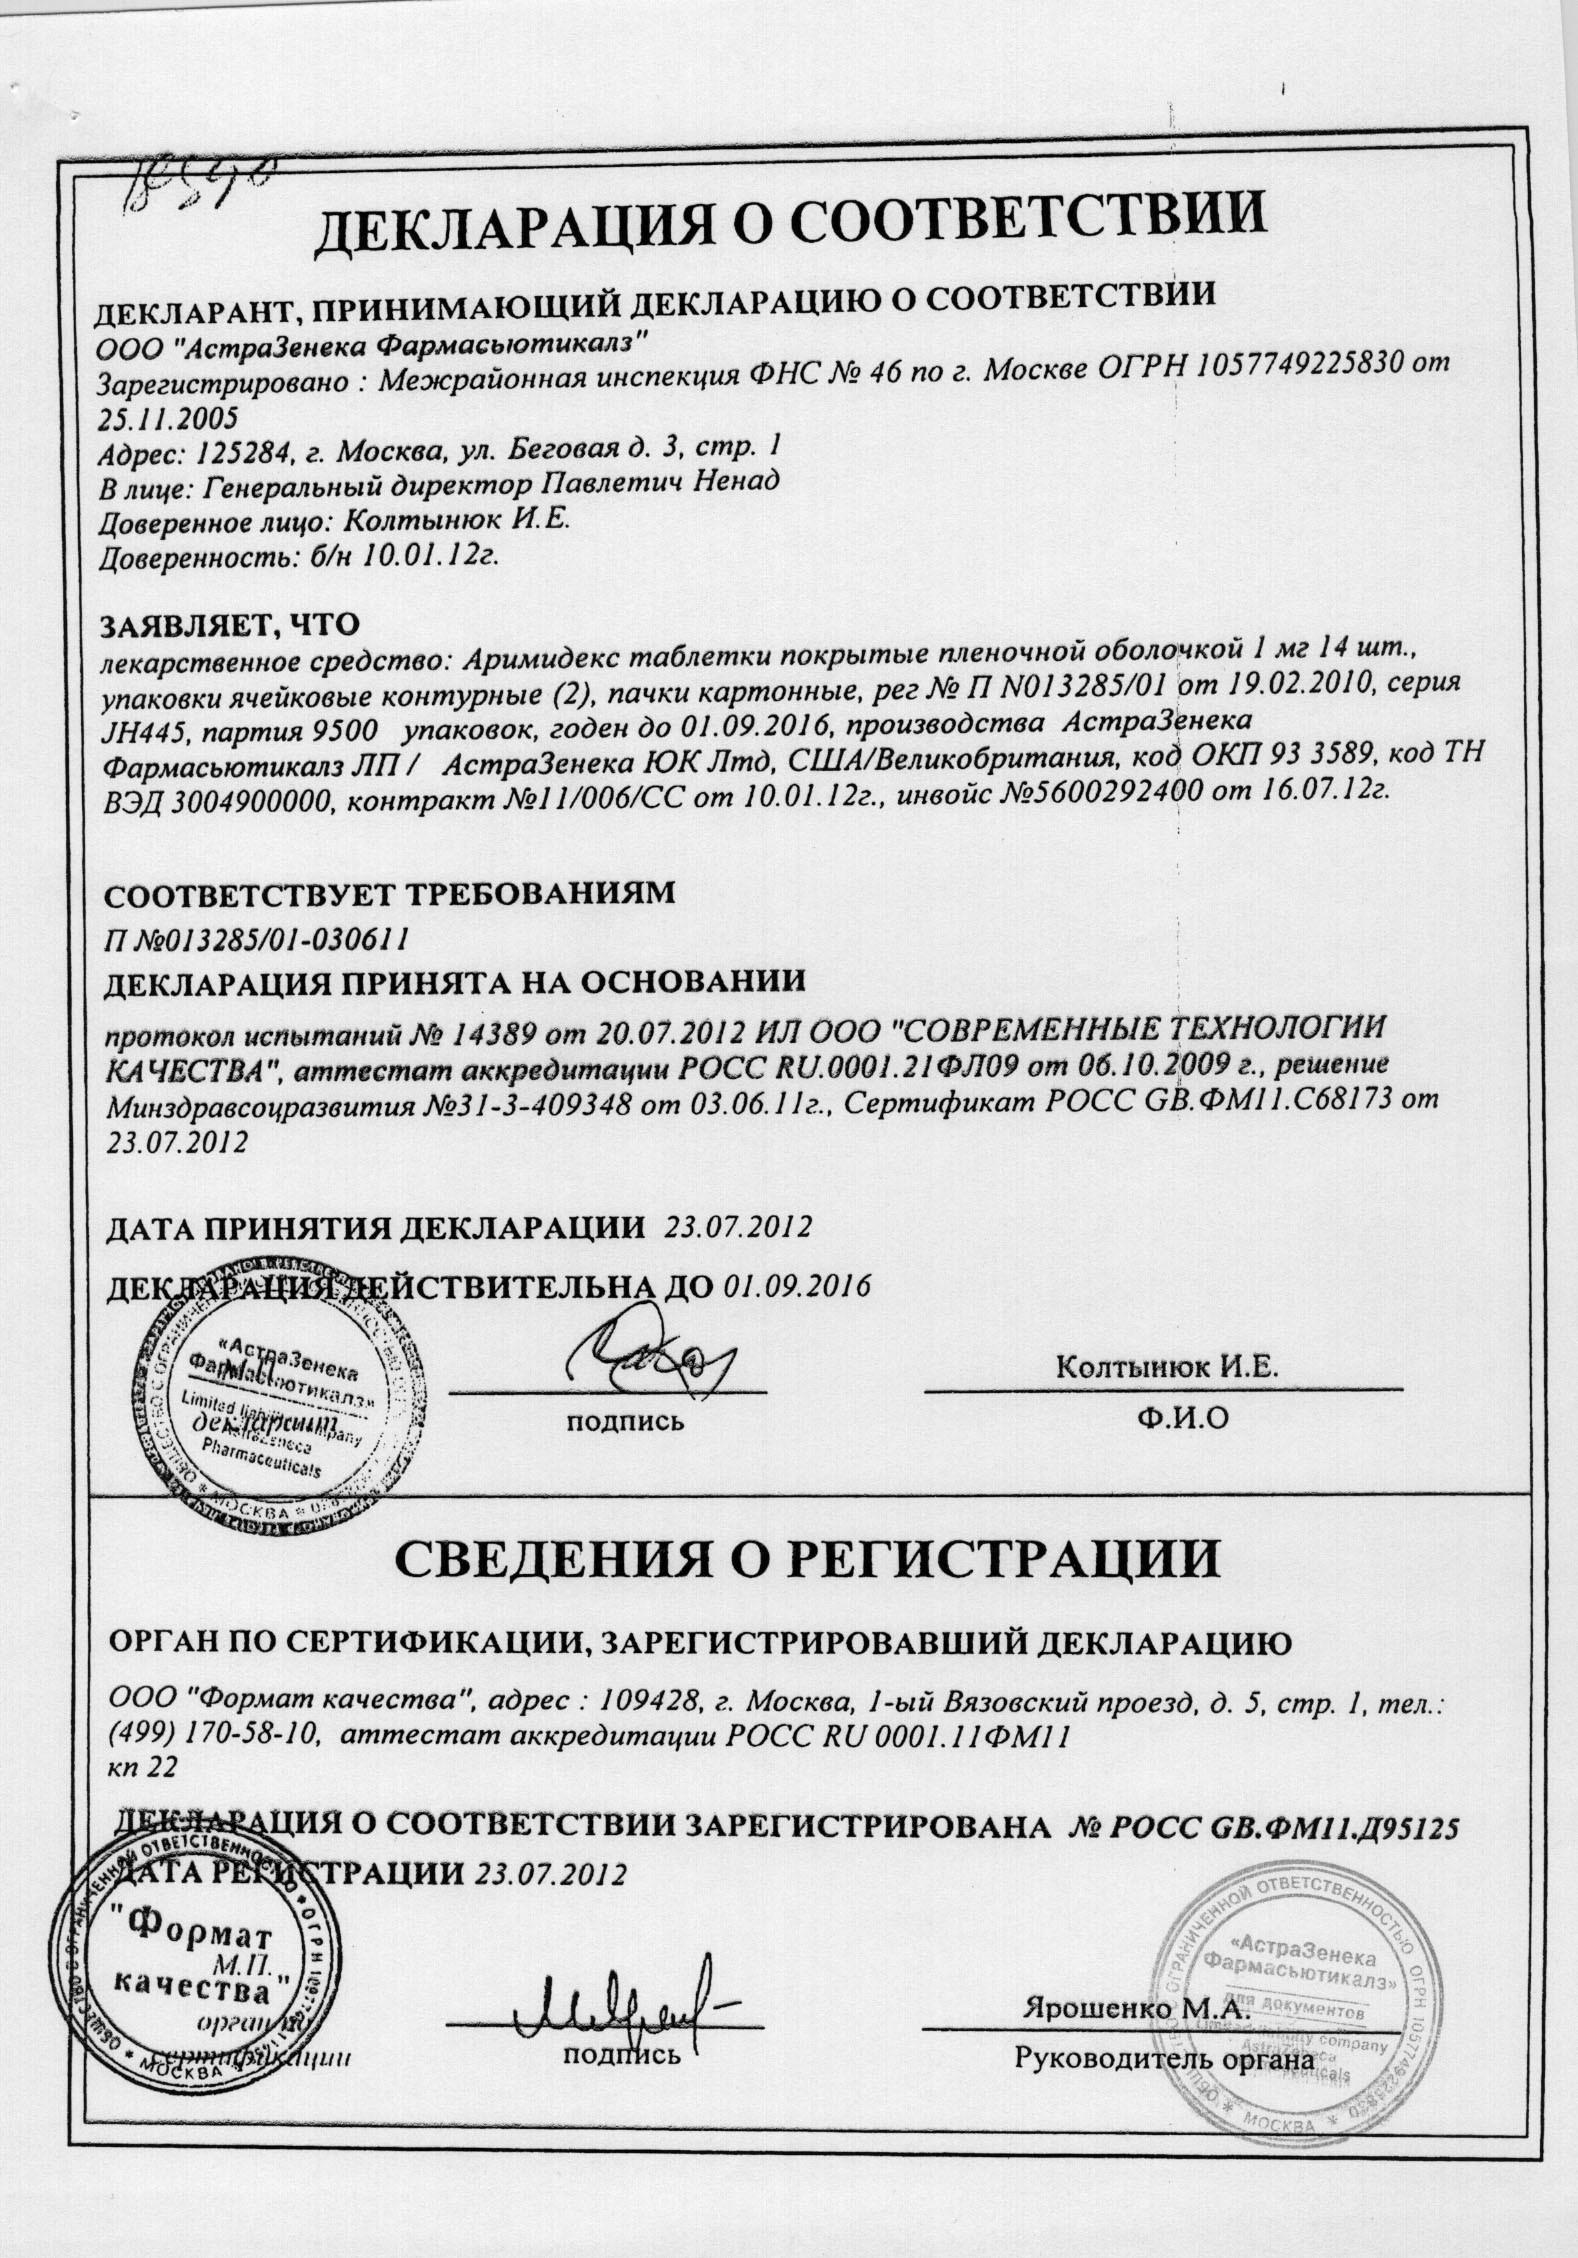 https://avisfarm.com/i/lek/certificates/7471102/38515-00589583.jpg?id=28